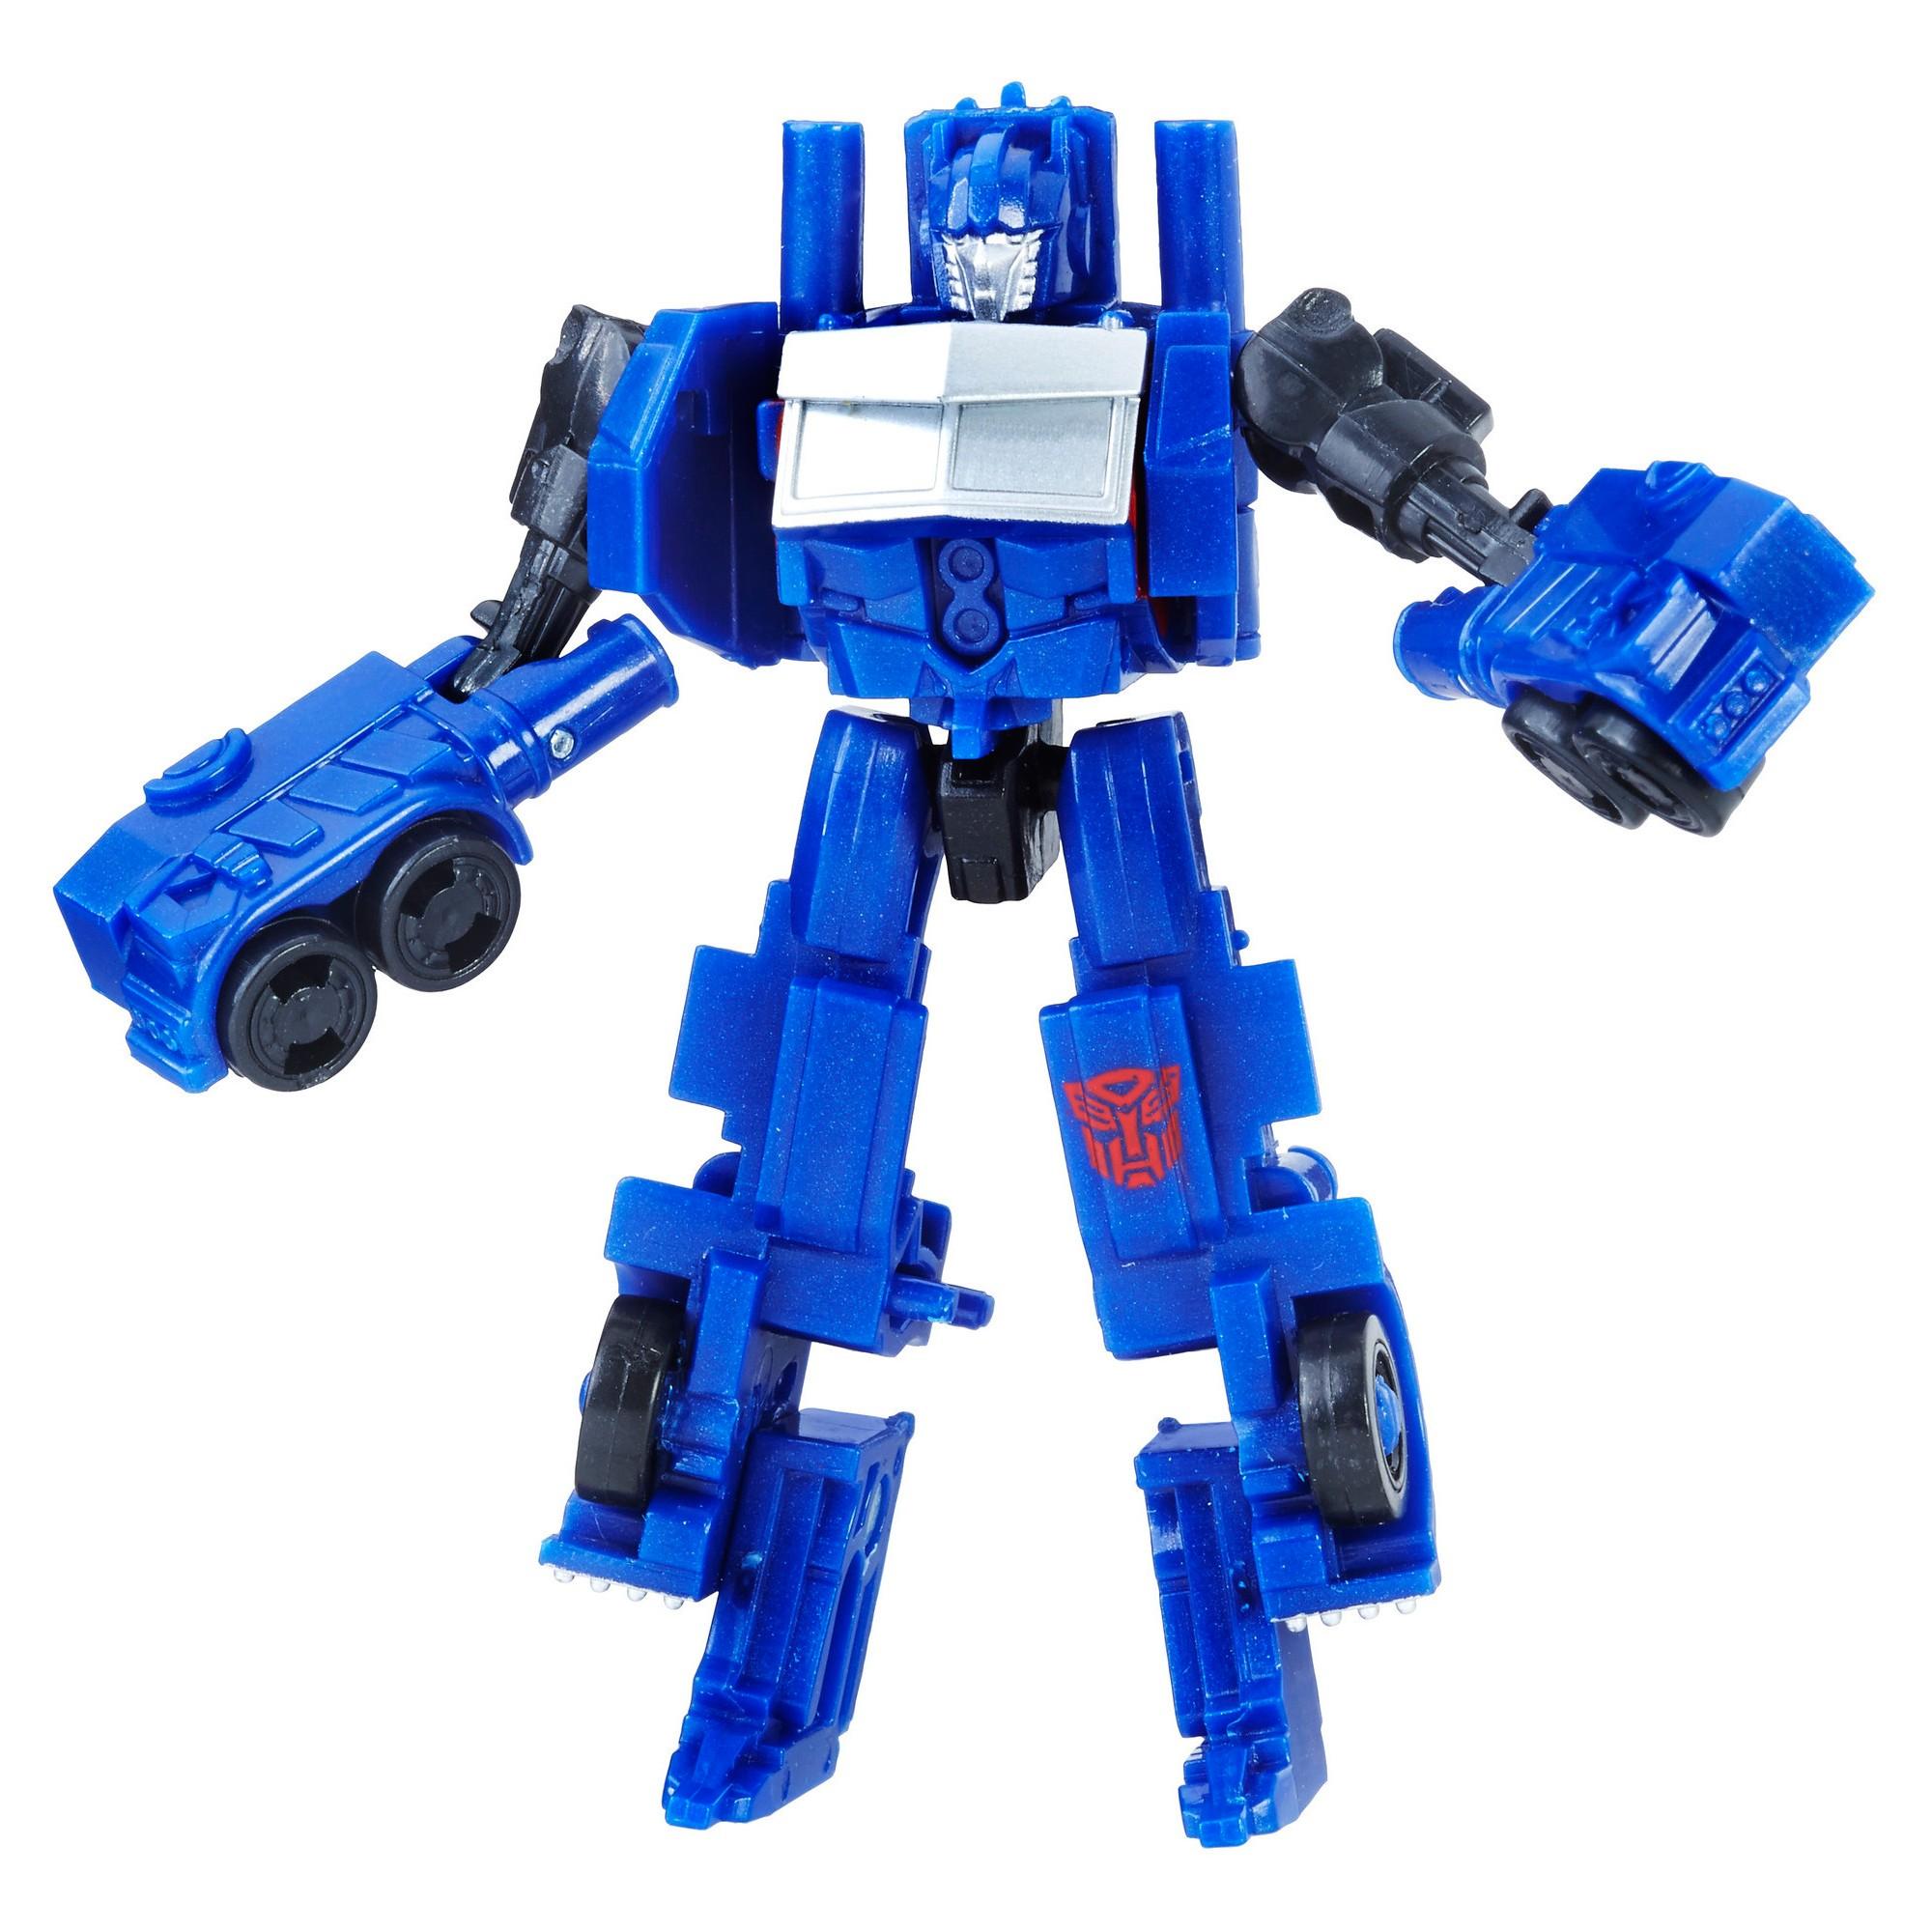 OPTIMUS PRIME Transformers Last Knight Legion Class Movie TLK Hasbro New 2017